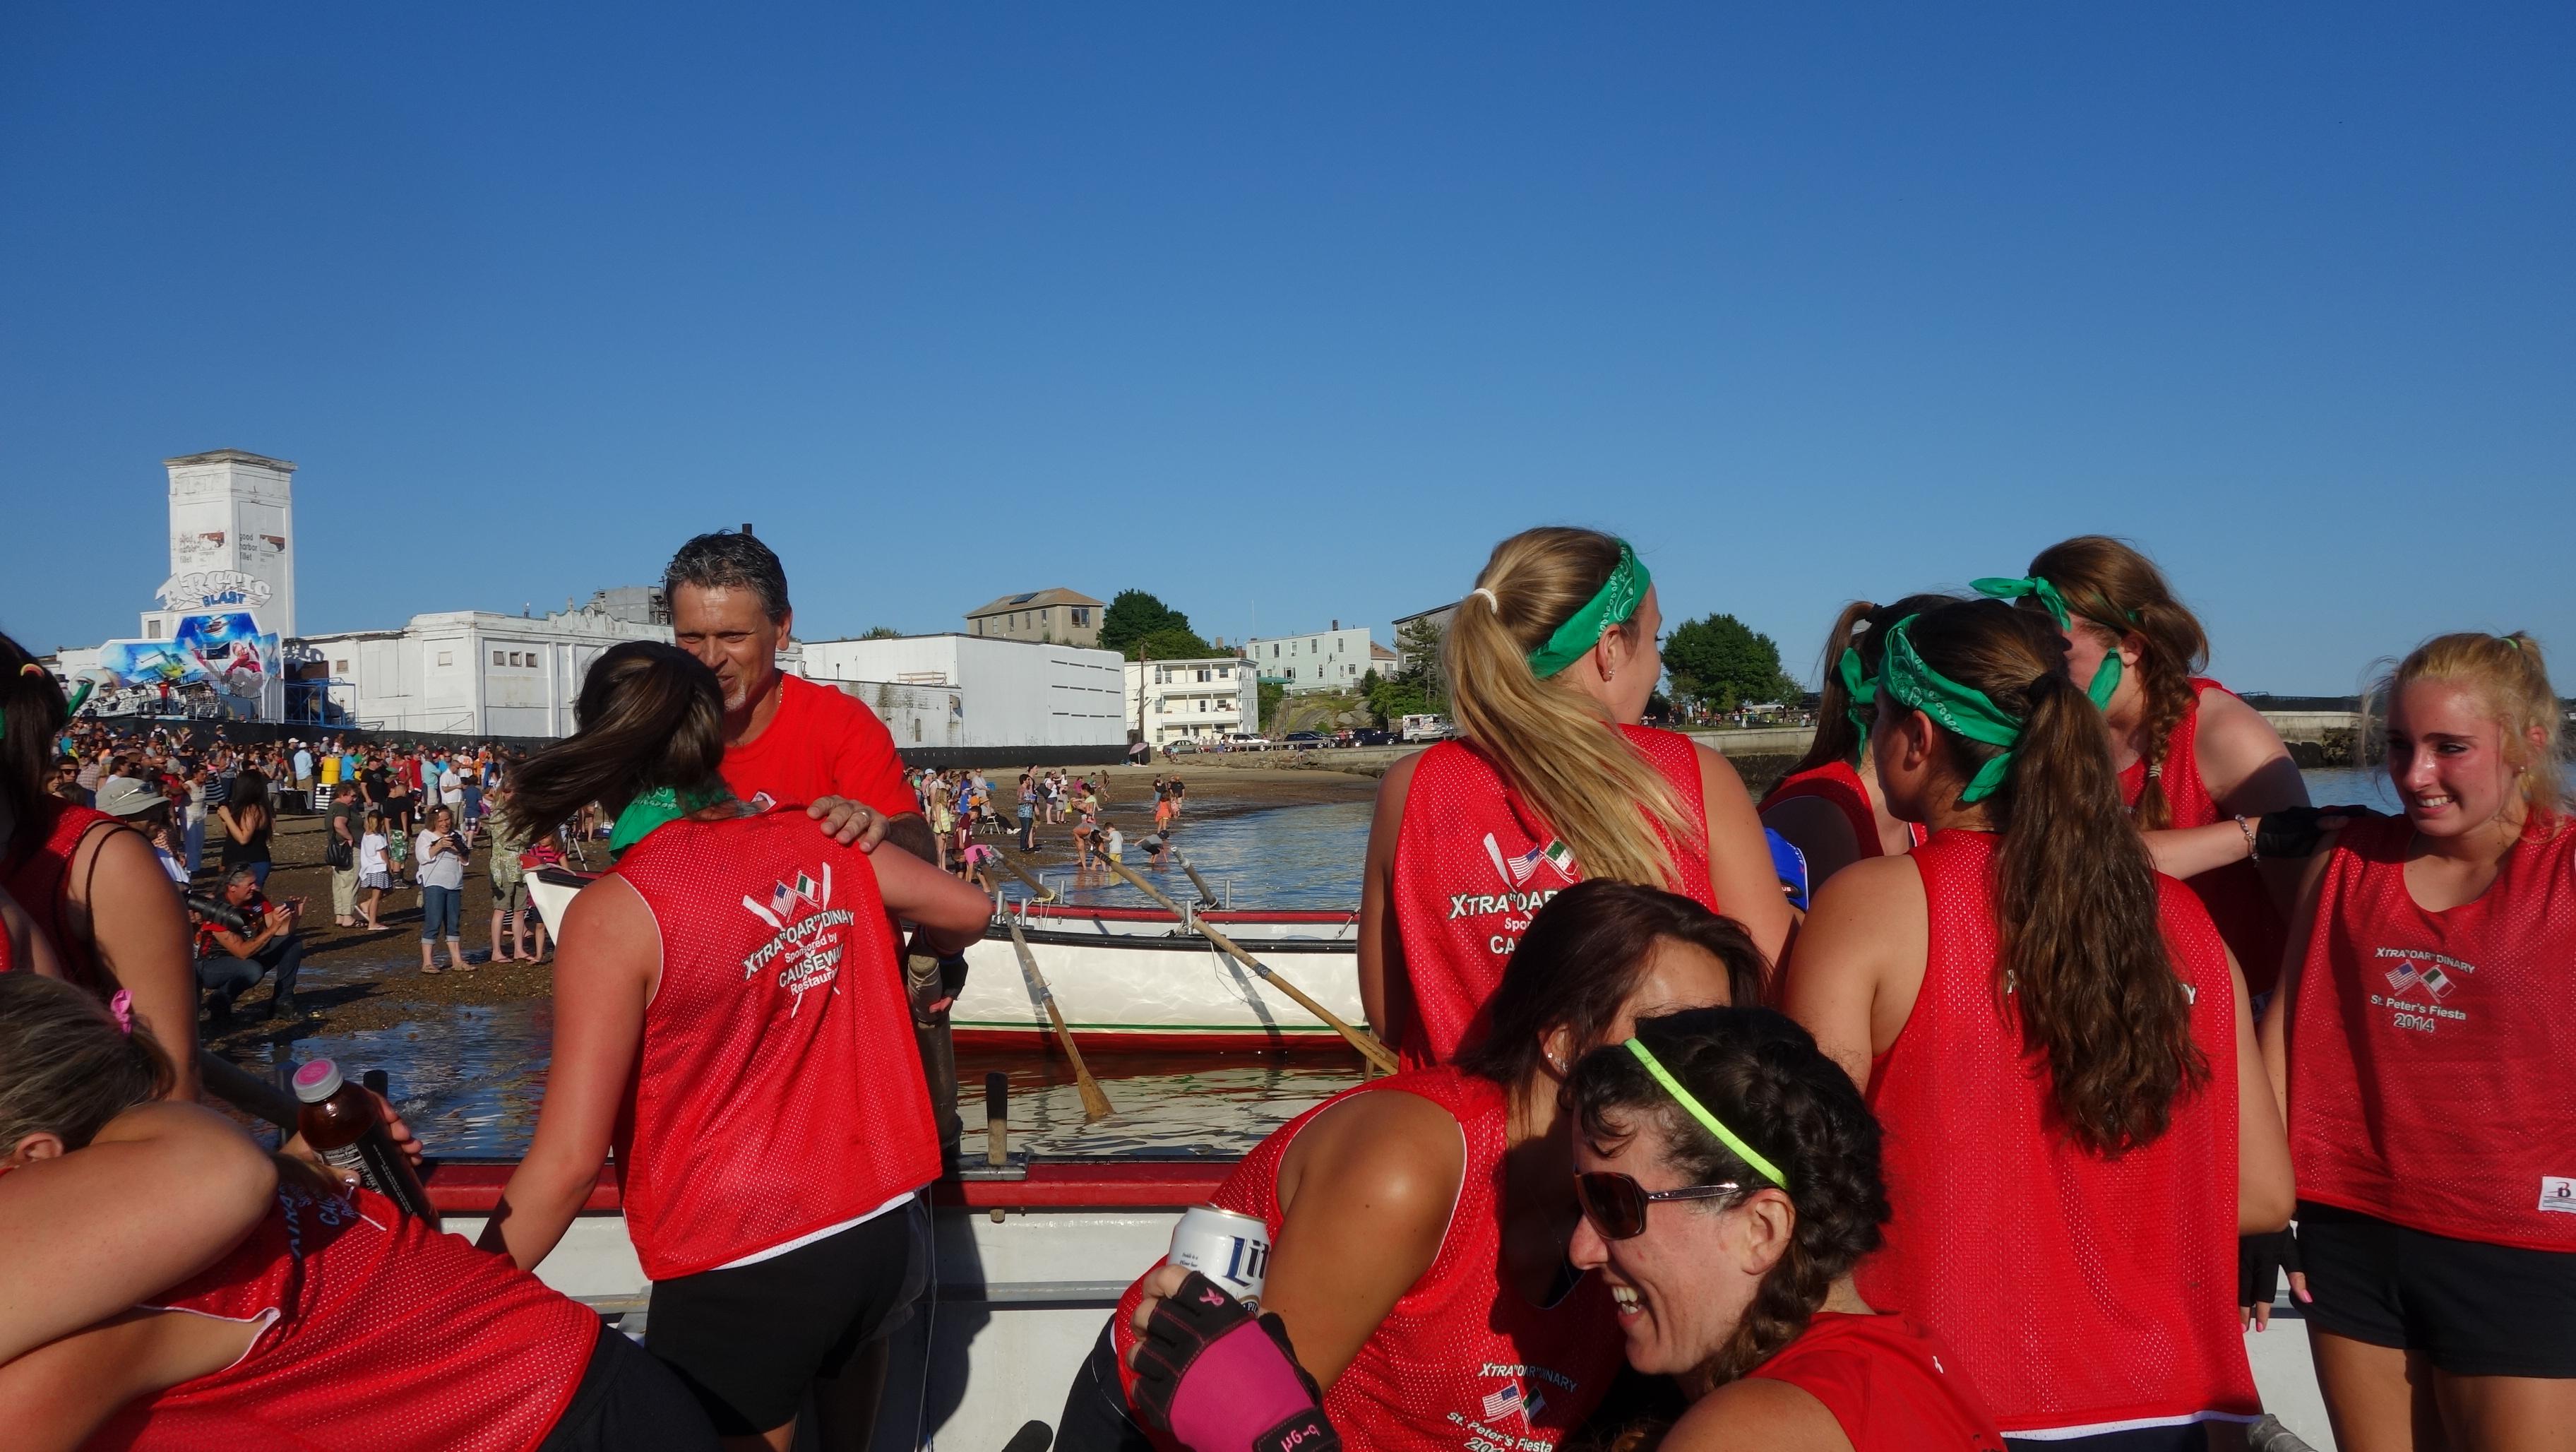 Amanda Race St. Peter's Fiesta 2014 Camps! 216